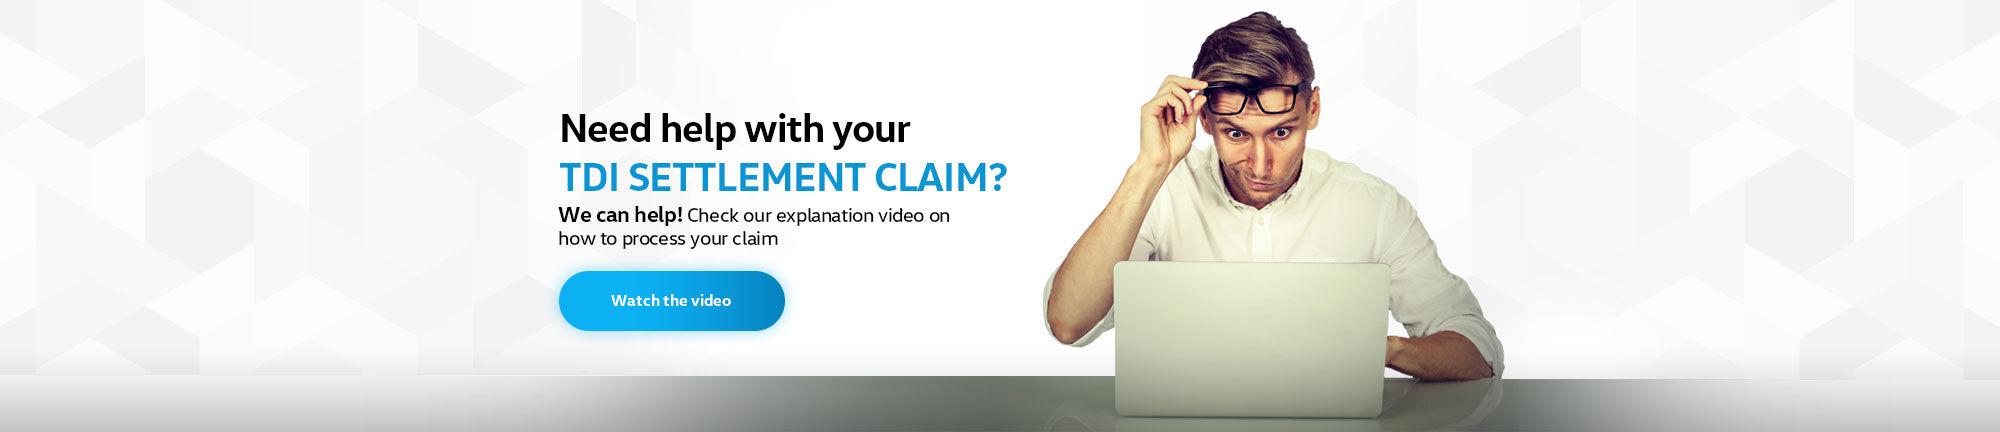 TDI Settlement claim